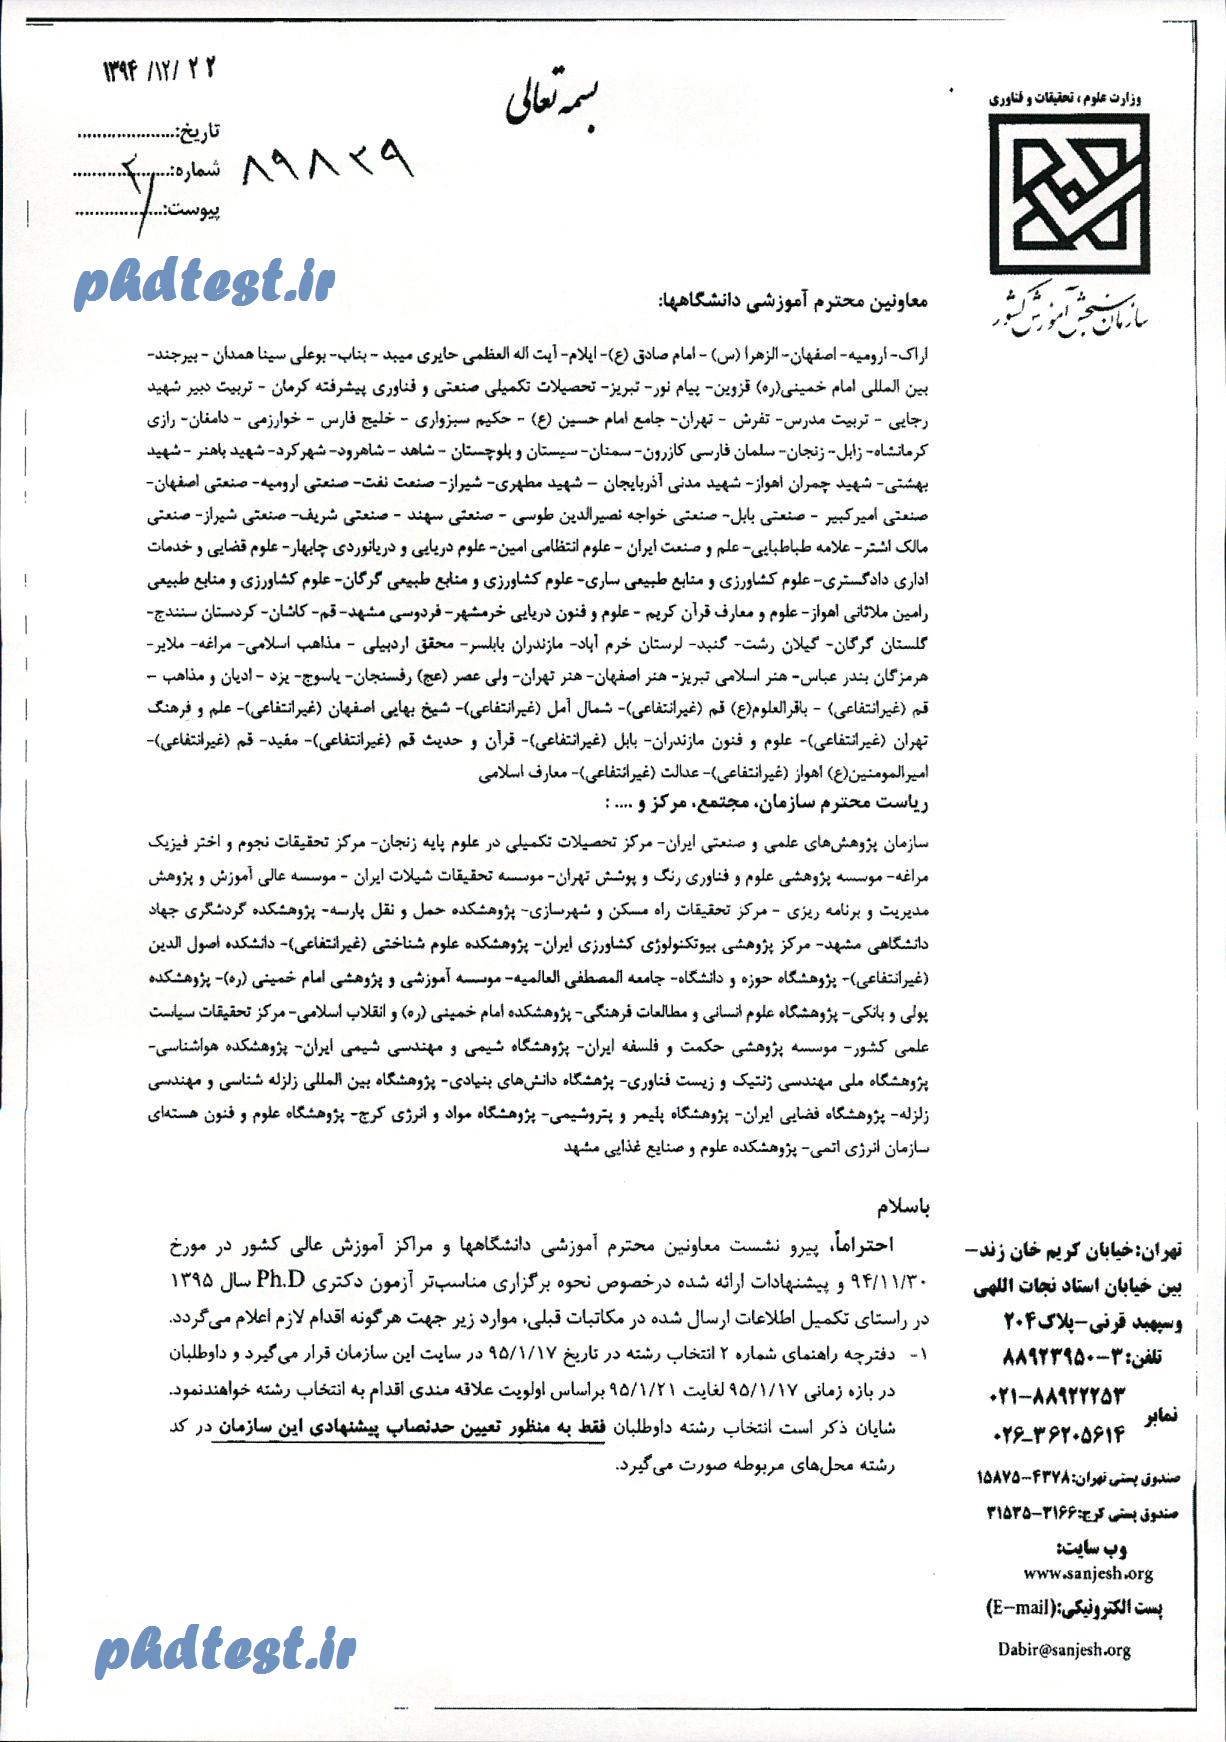 shiveh-nameh-phd-95-01